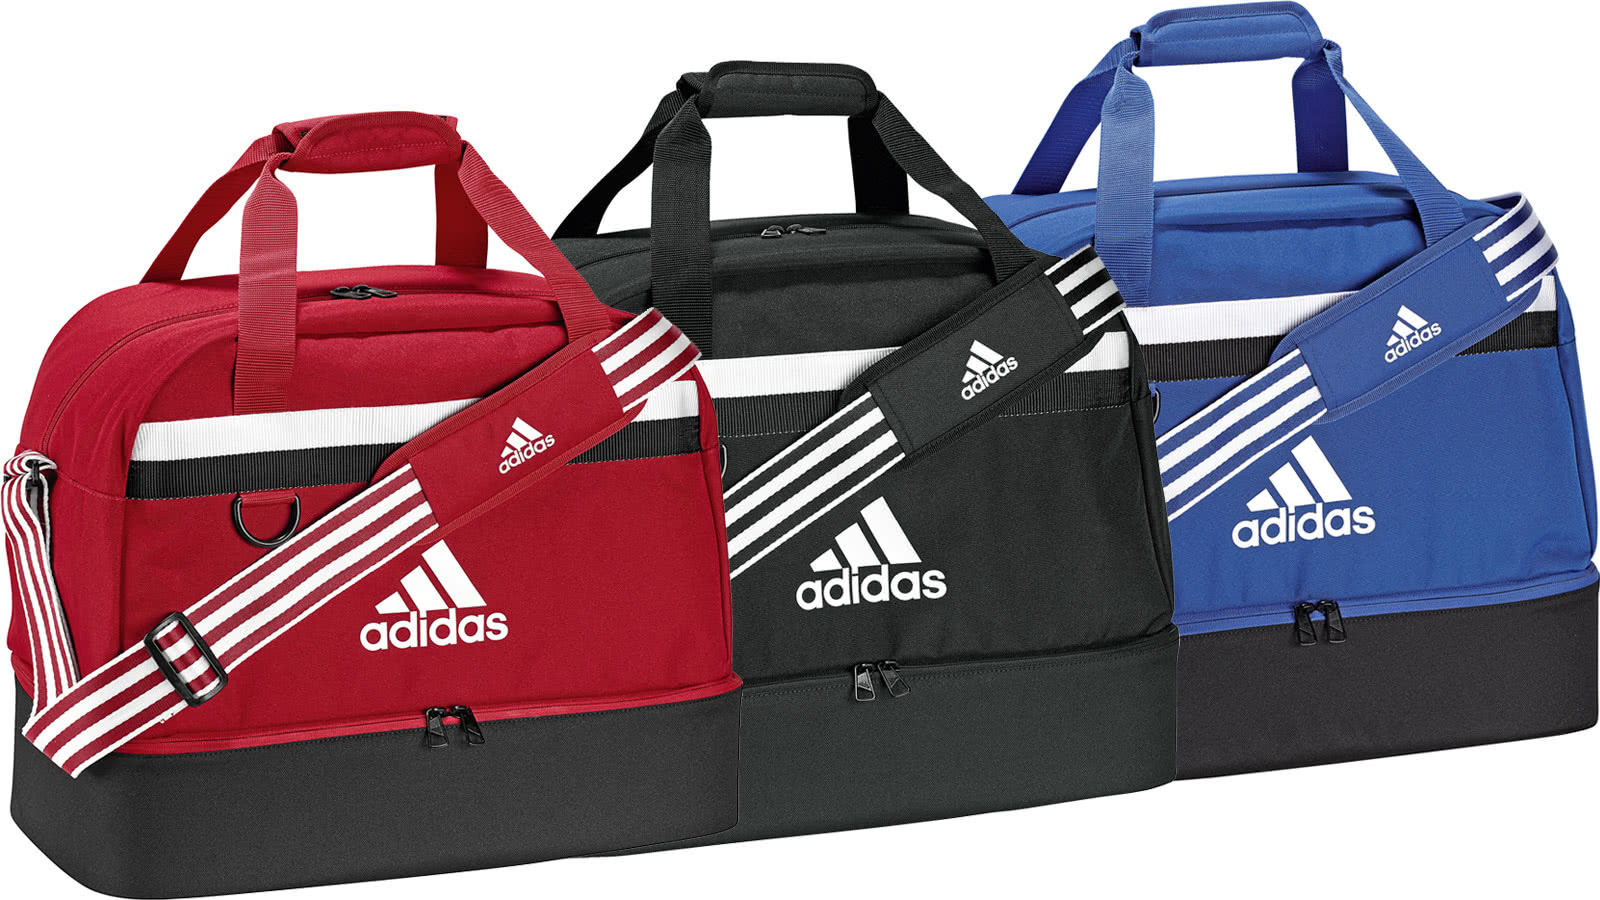 Adidas Tiro 15 Teambag kaufen